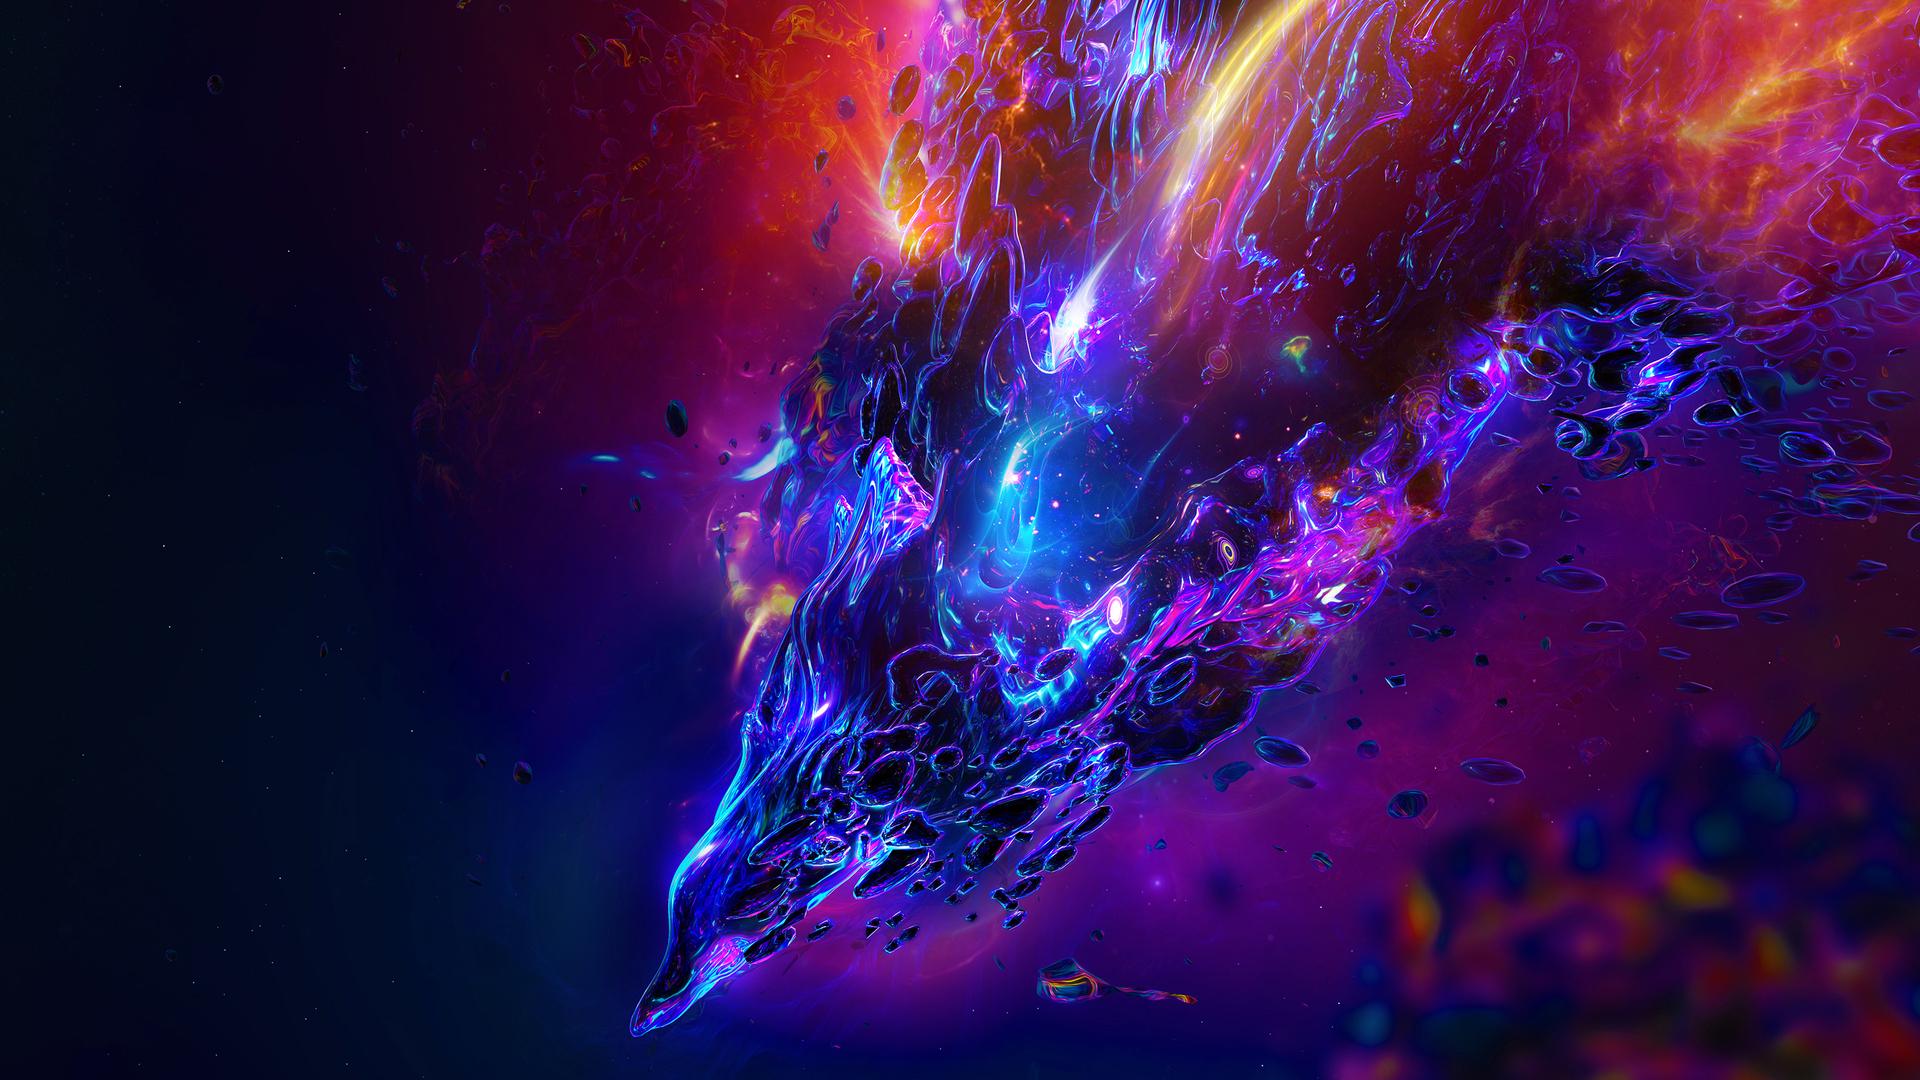 General 1920x1080 Color Burst abstract digital art render colorful shapes